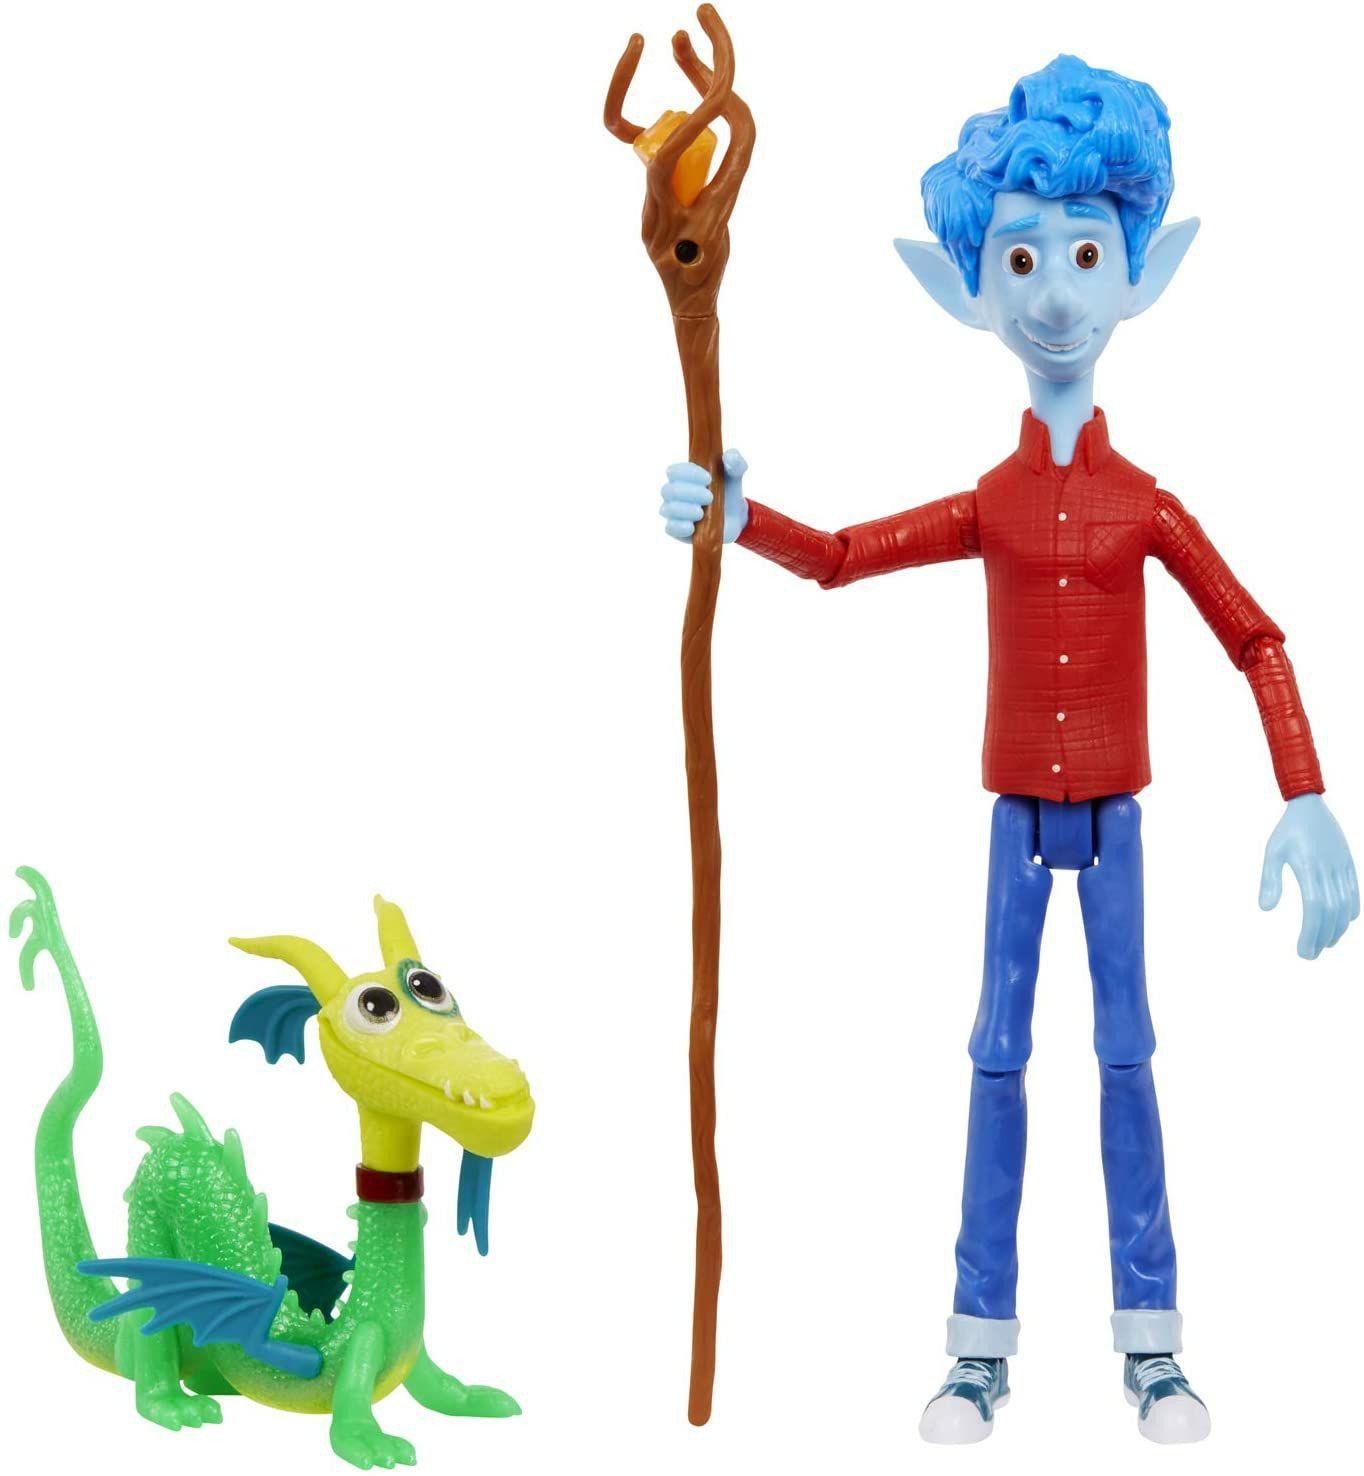 Pixar Onward Ian Lightfoot Figure - £3.10 (+£4.49 without Prime) @ Amazon